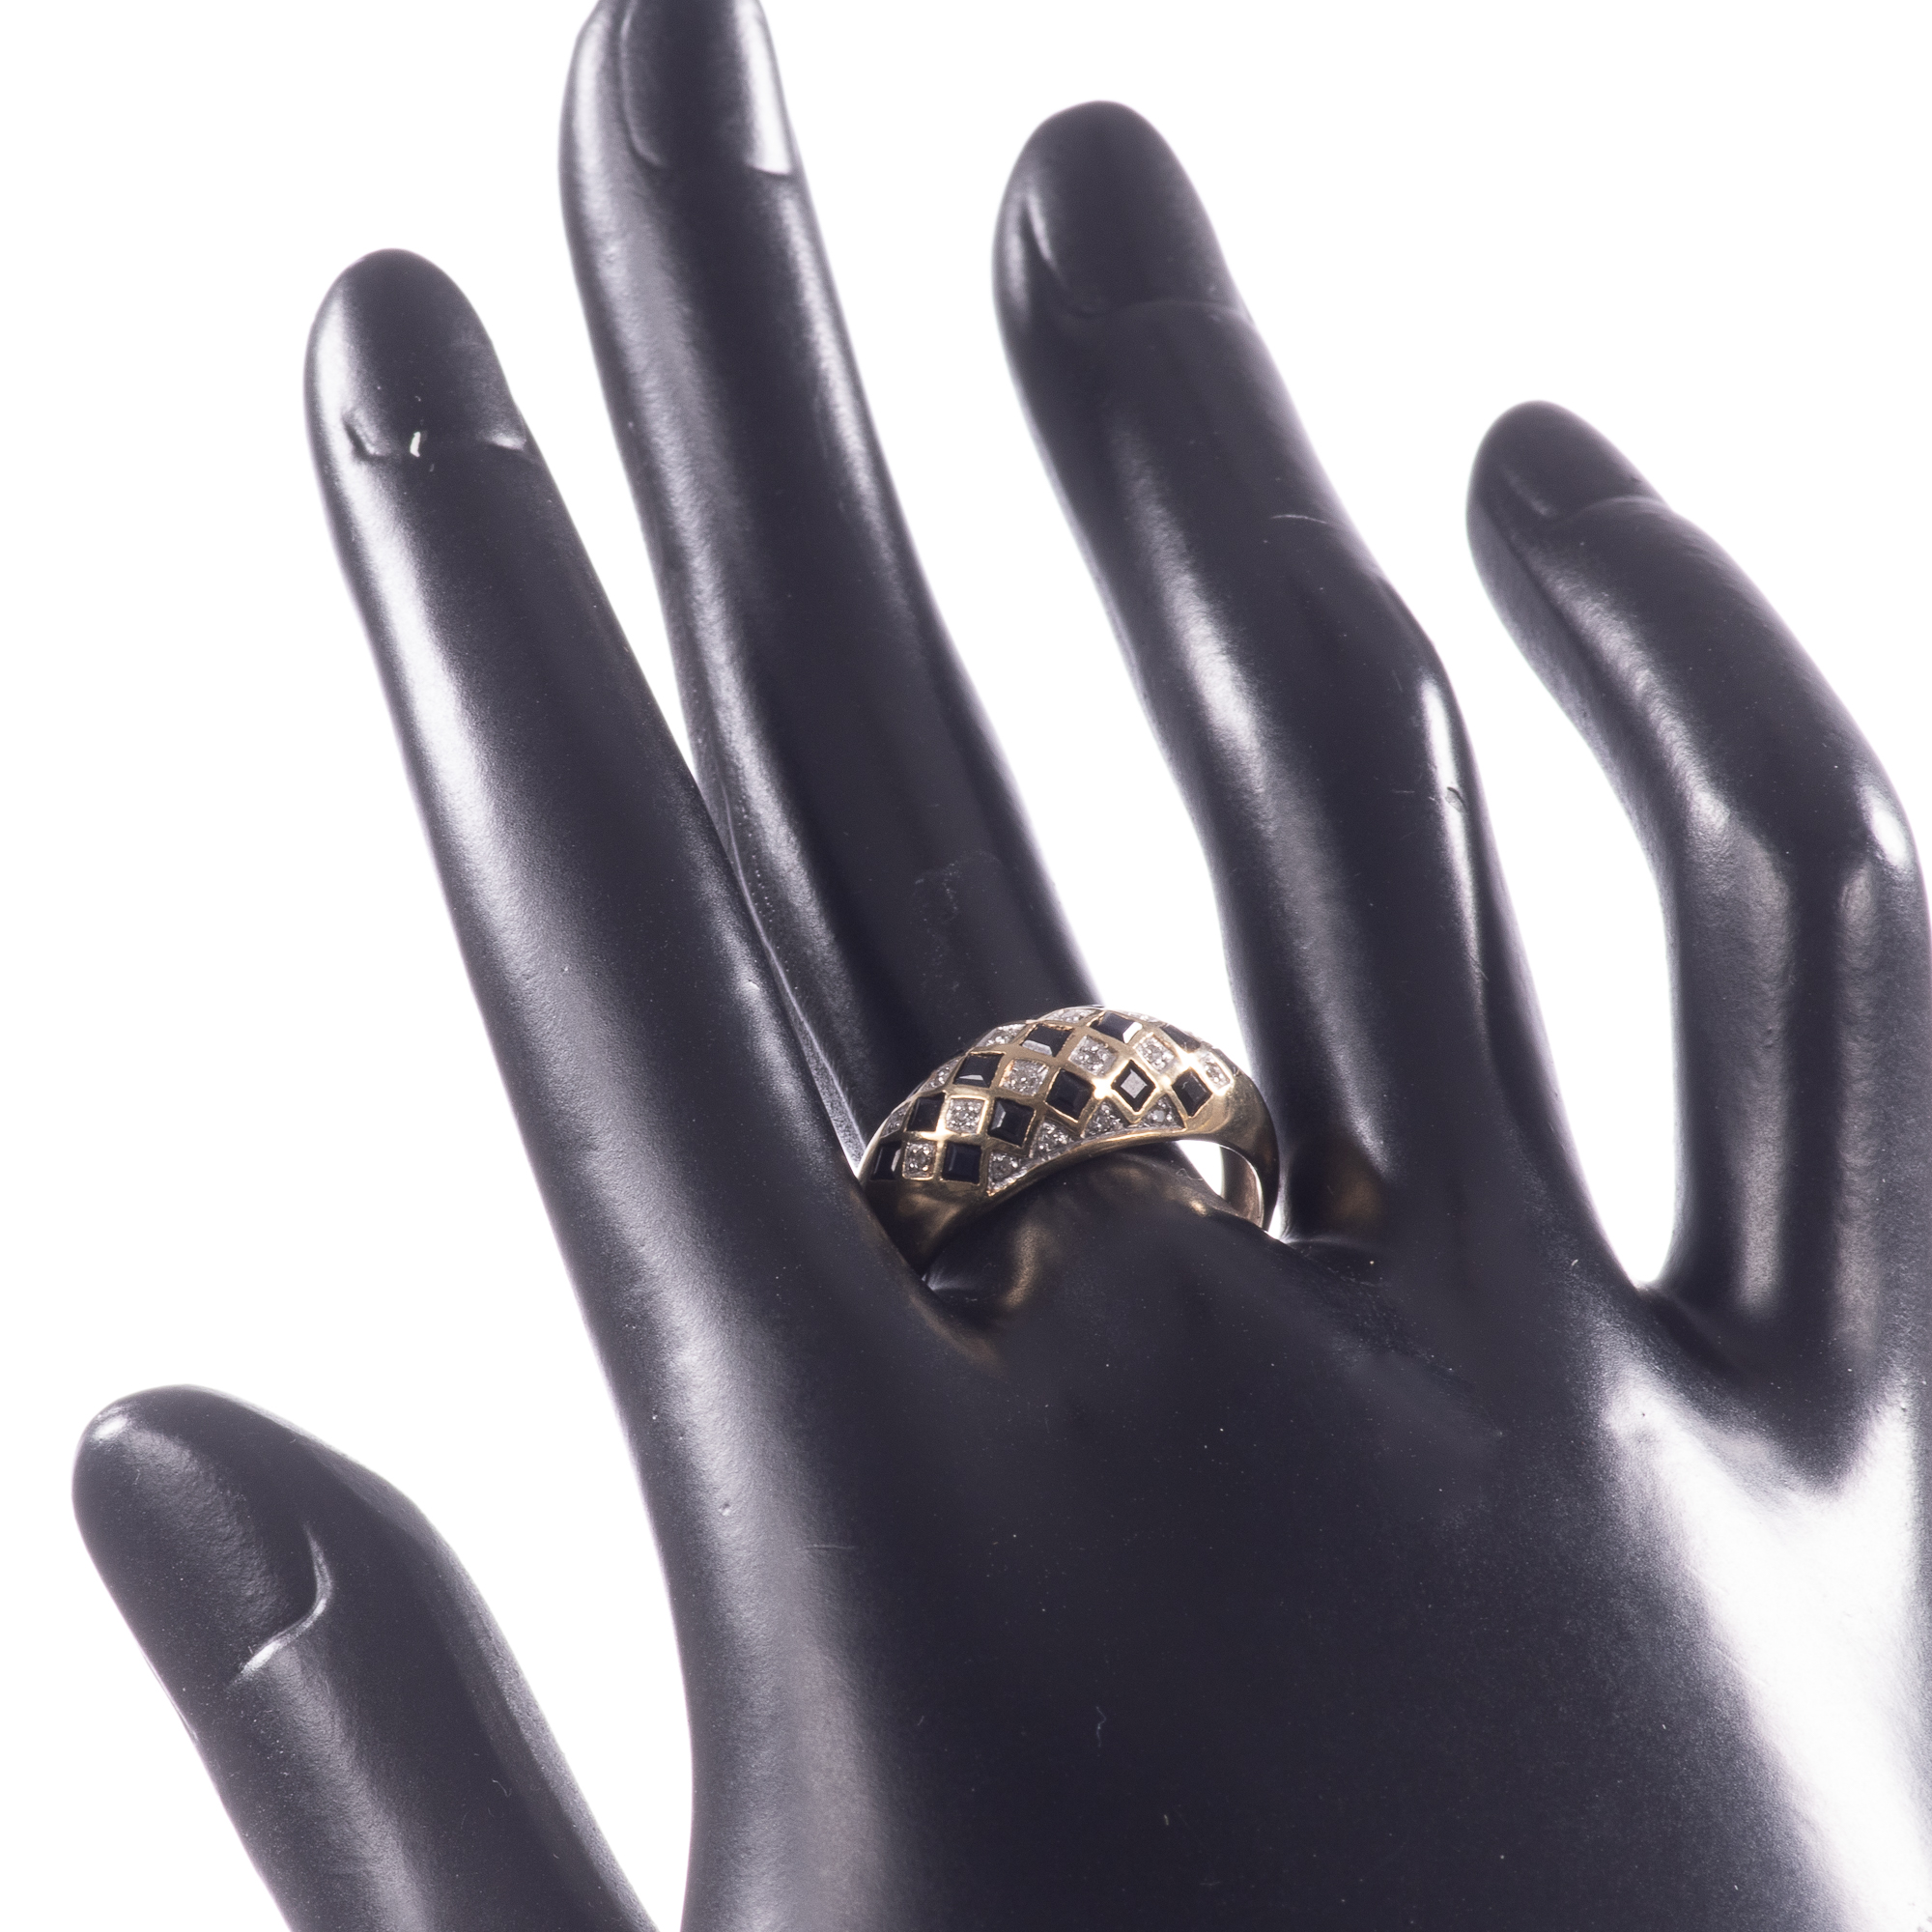 9ct Gold Art Deco Style 0.68ct Sapphire & Diamond Ring - Image 2 of 8